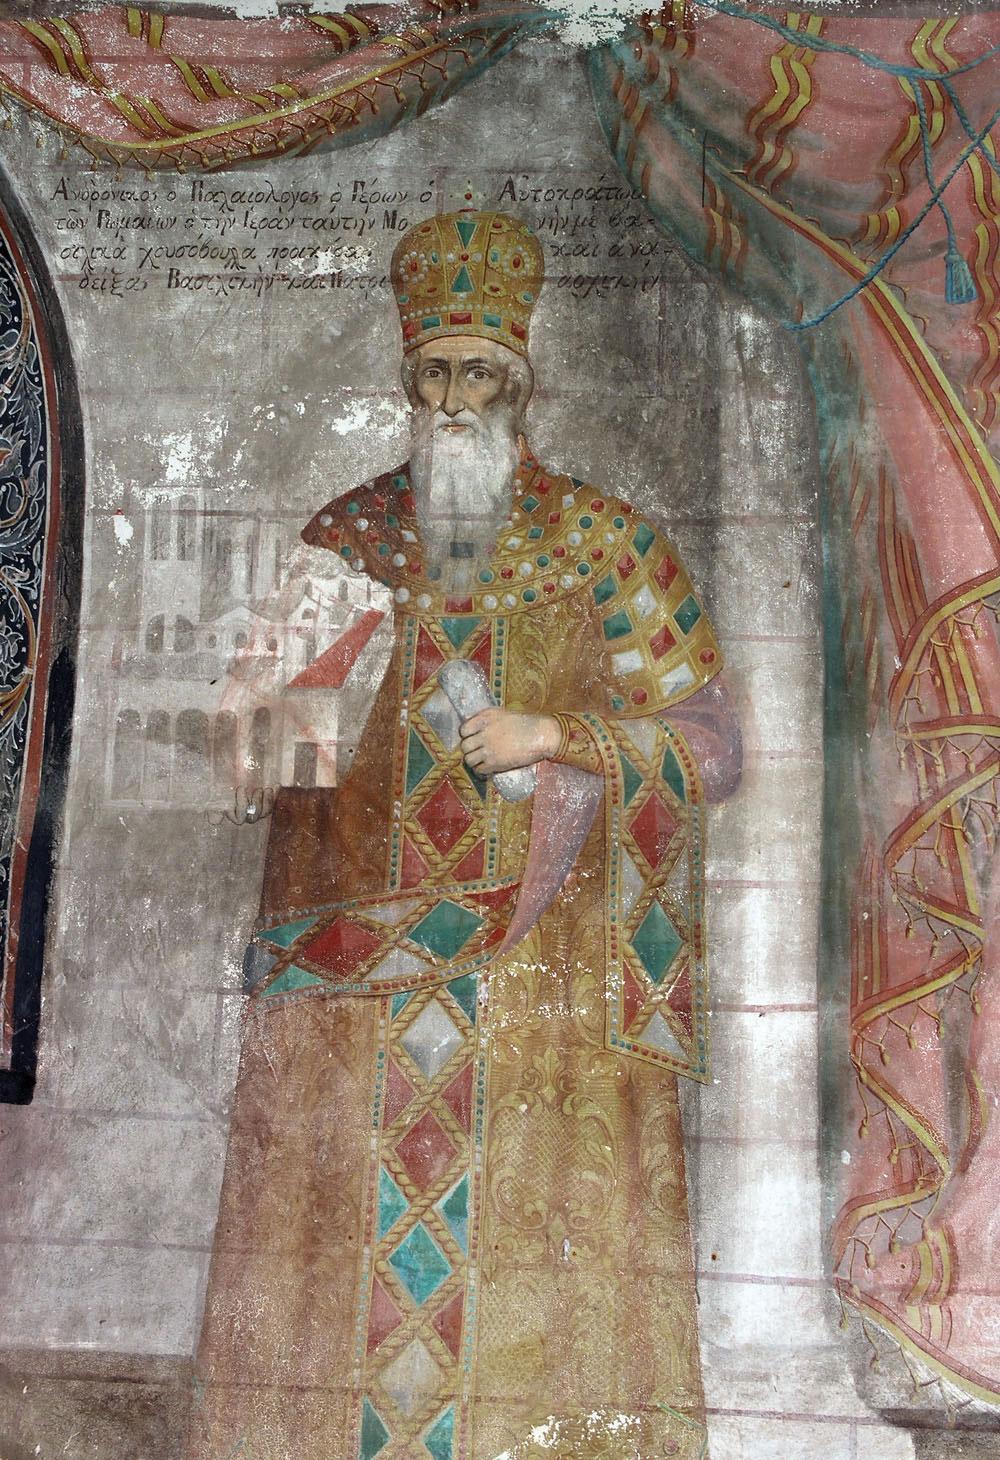 Andronicus-II-Palaeologus-detail-fresco-monastery-Moni